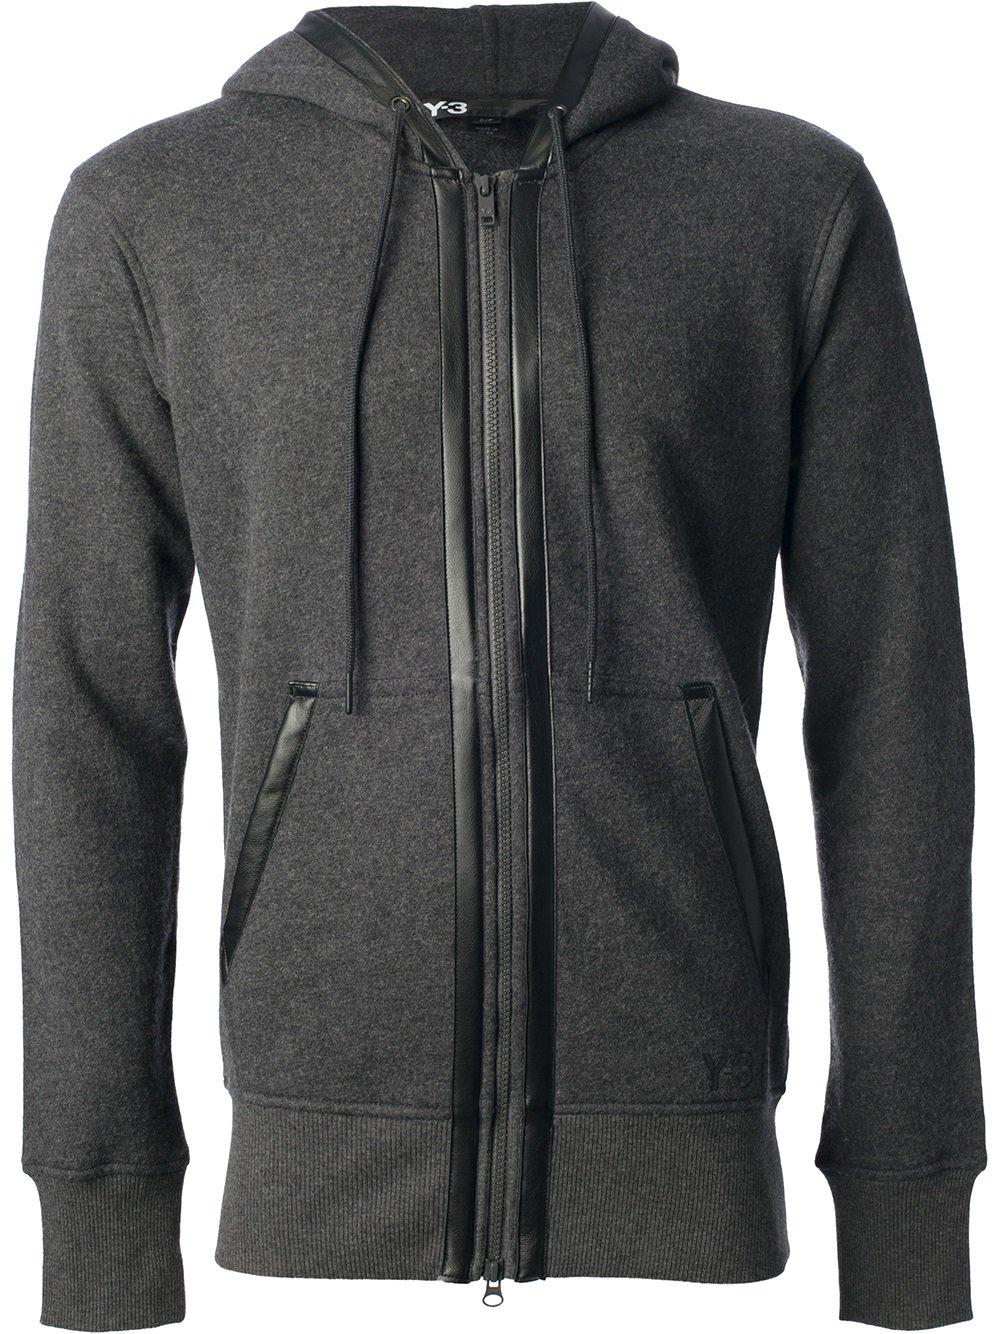 Lyst Y 3 Zip Up Hoodie In Gray For Men